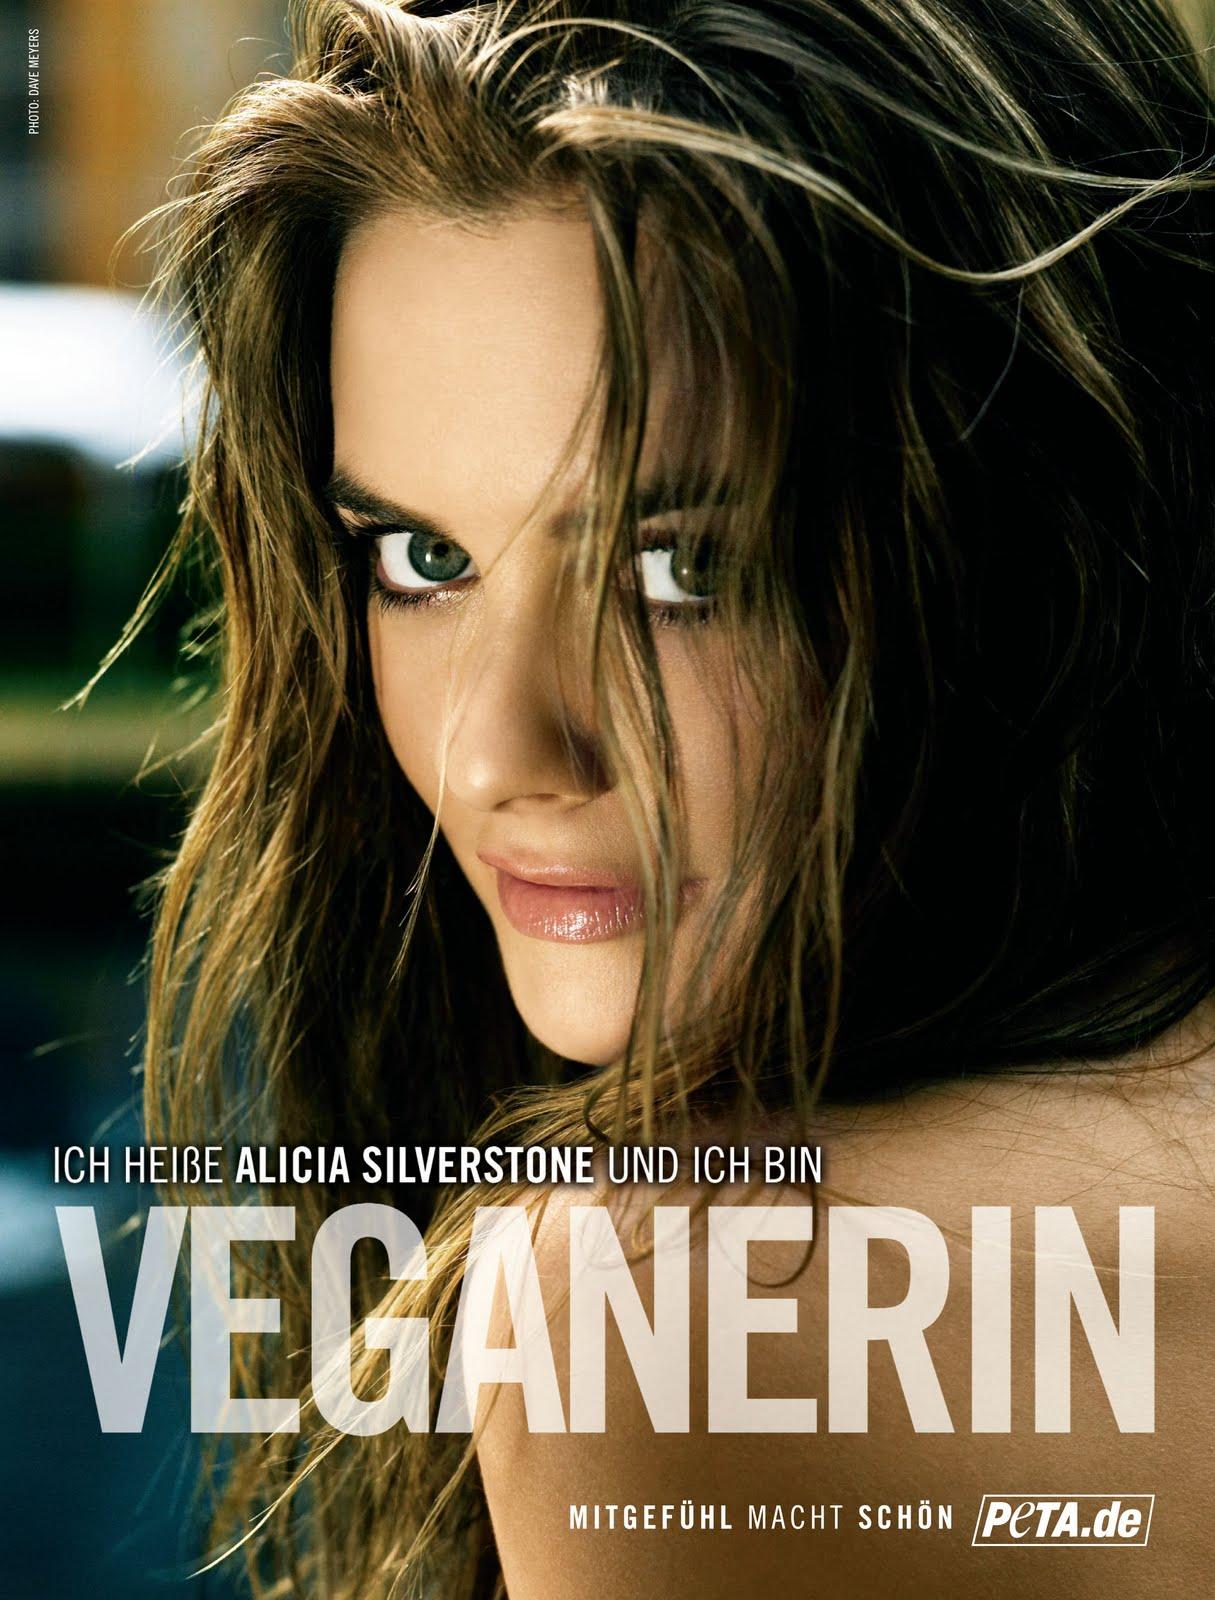 http://3.bp.blogspot.com/_V3n4yh3JzEc/TTHfSkbJGbI/AAAAAAAAAzw/l9cDgus_3Fc/s1600/PETA_AliciaS_Vegan2_300.jpg